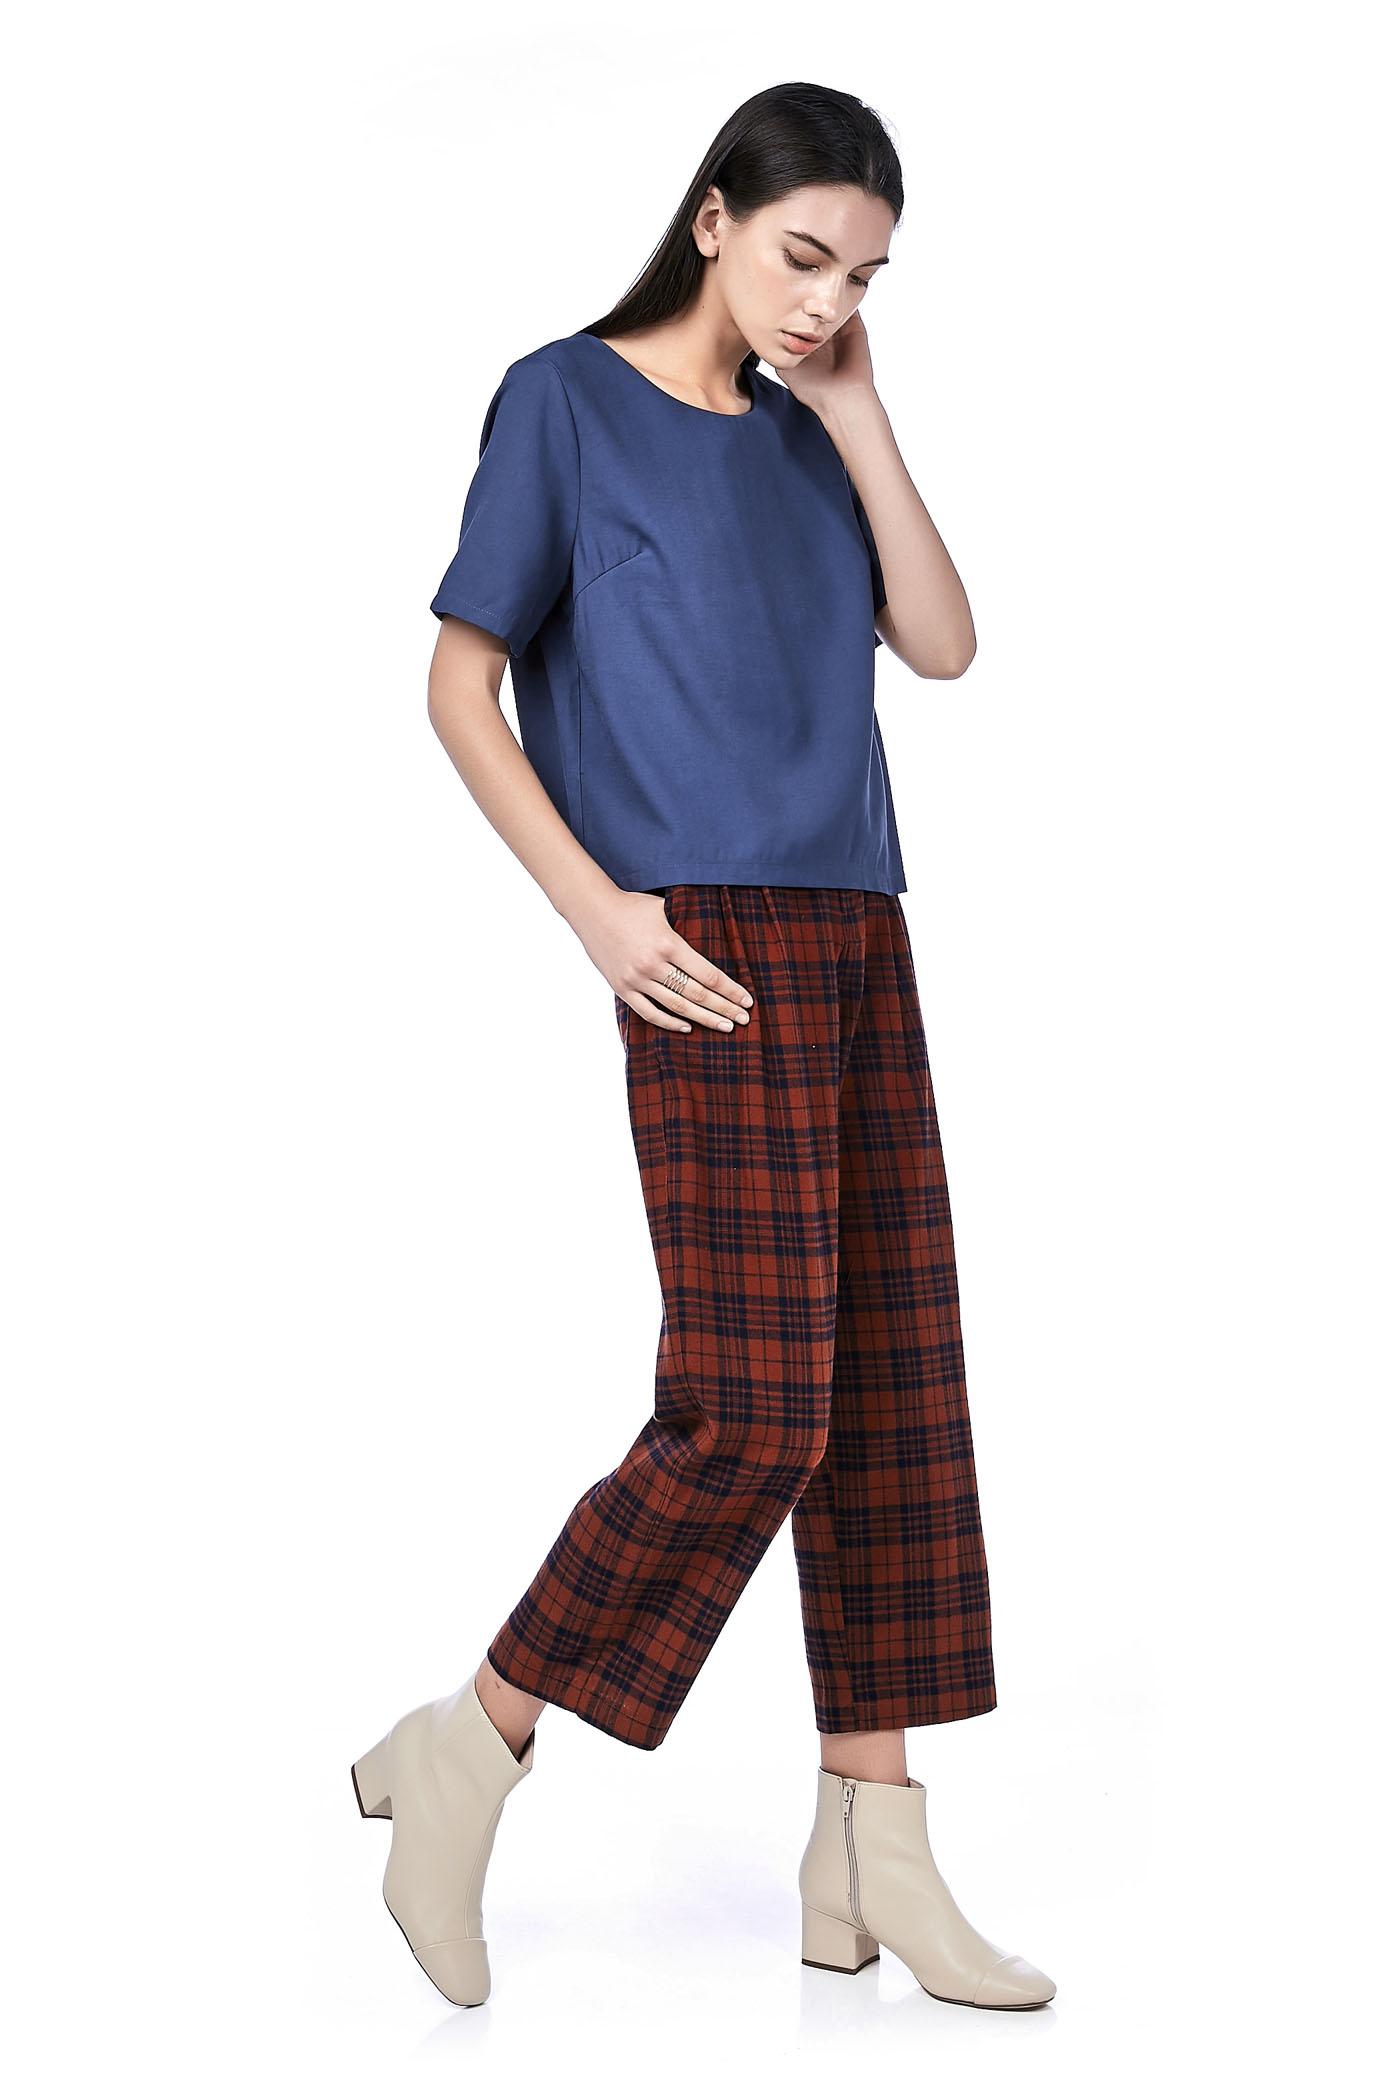 Biba Loose-Fit Trousers